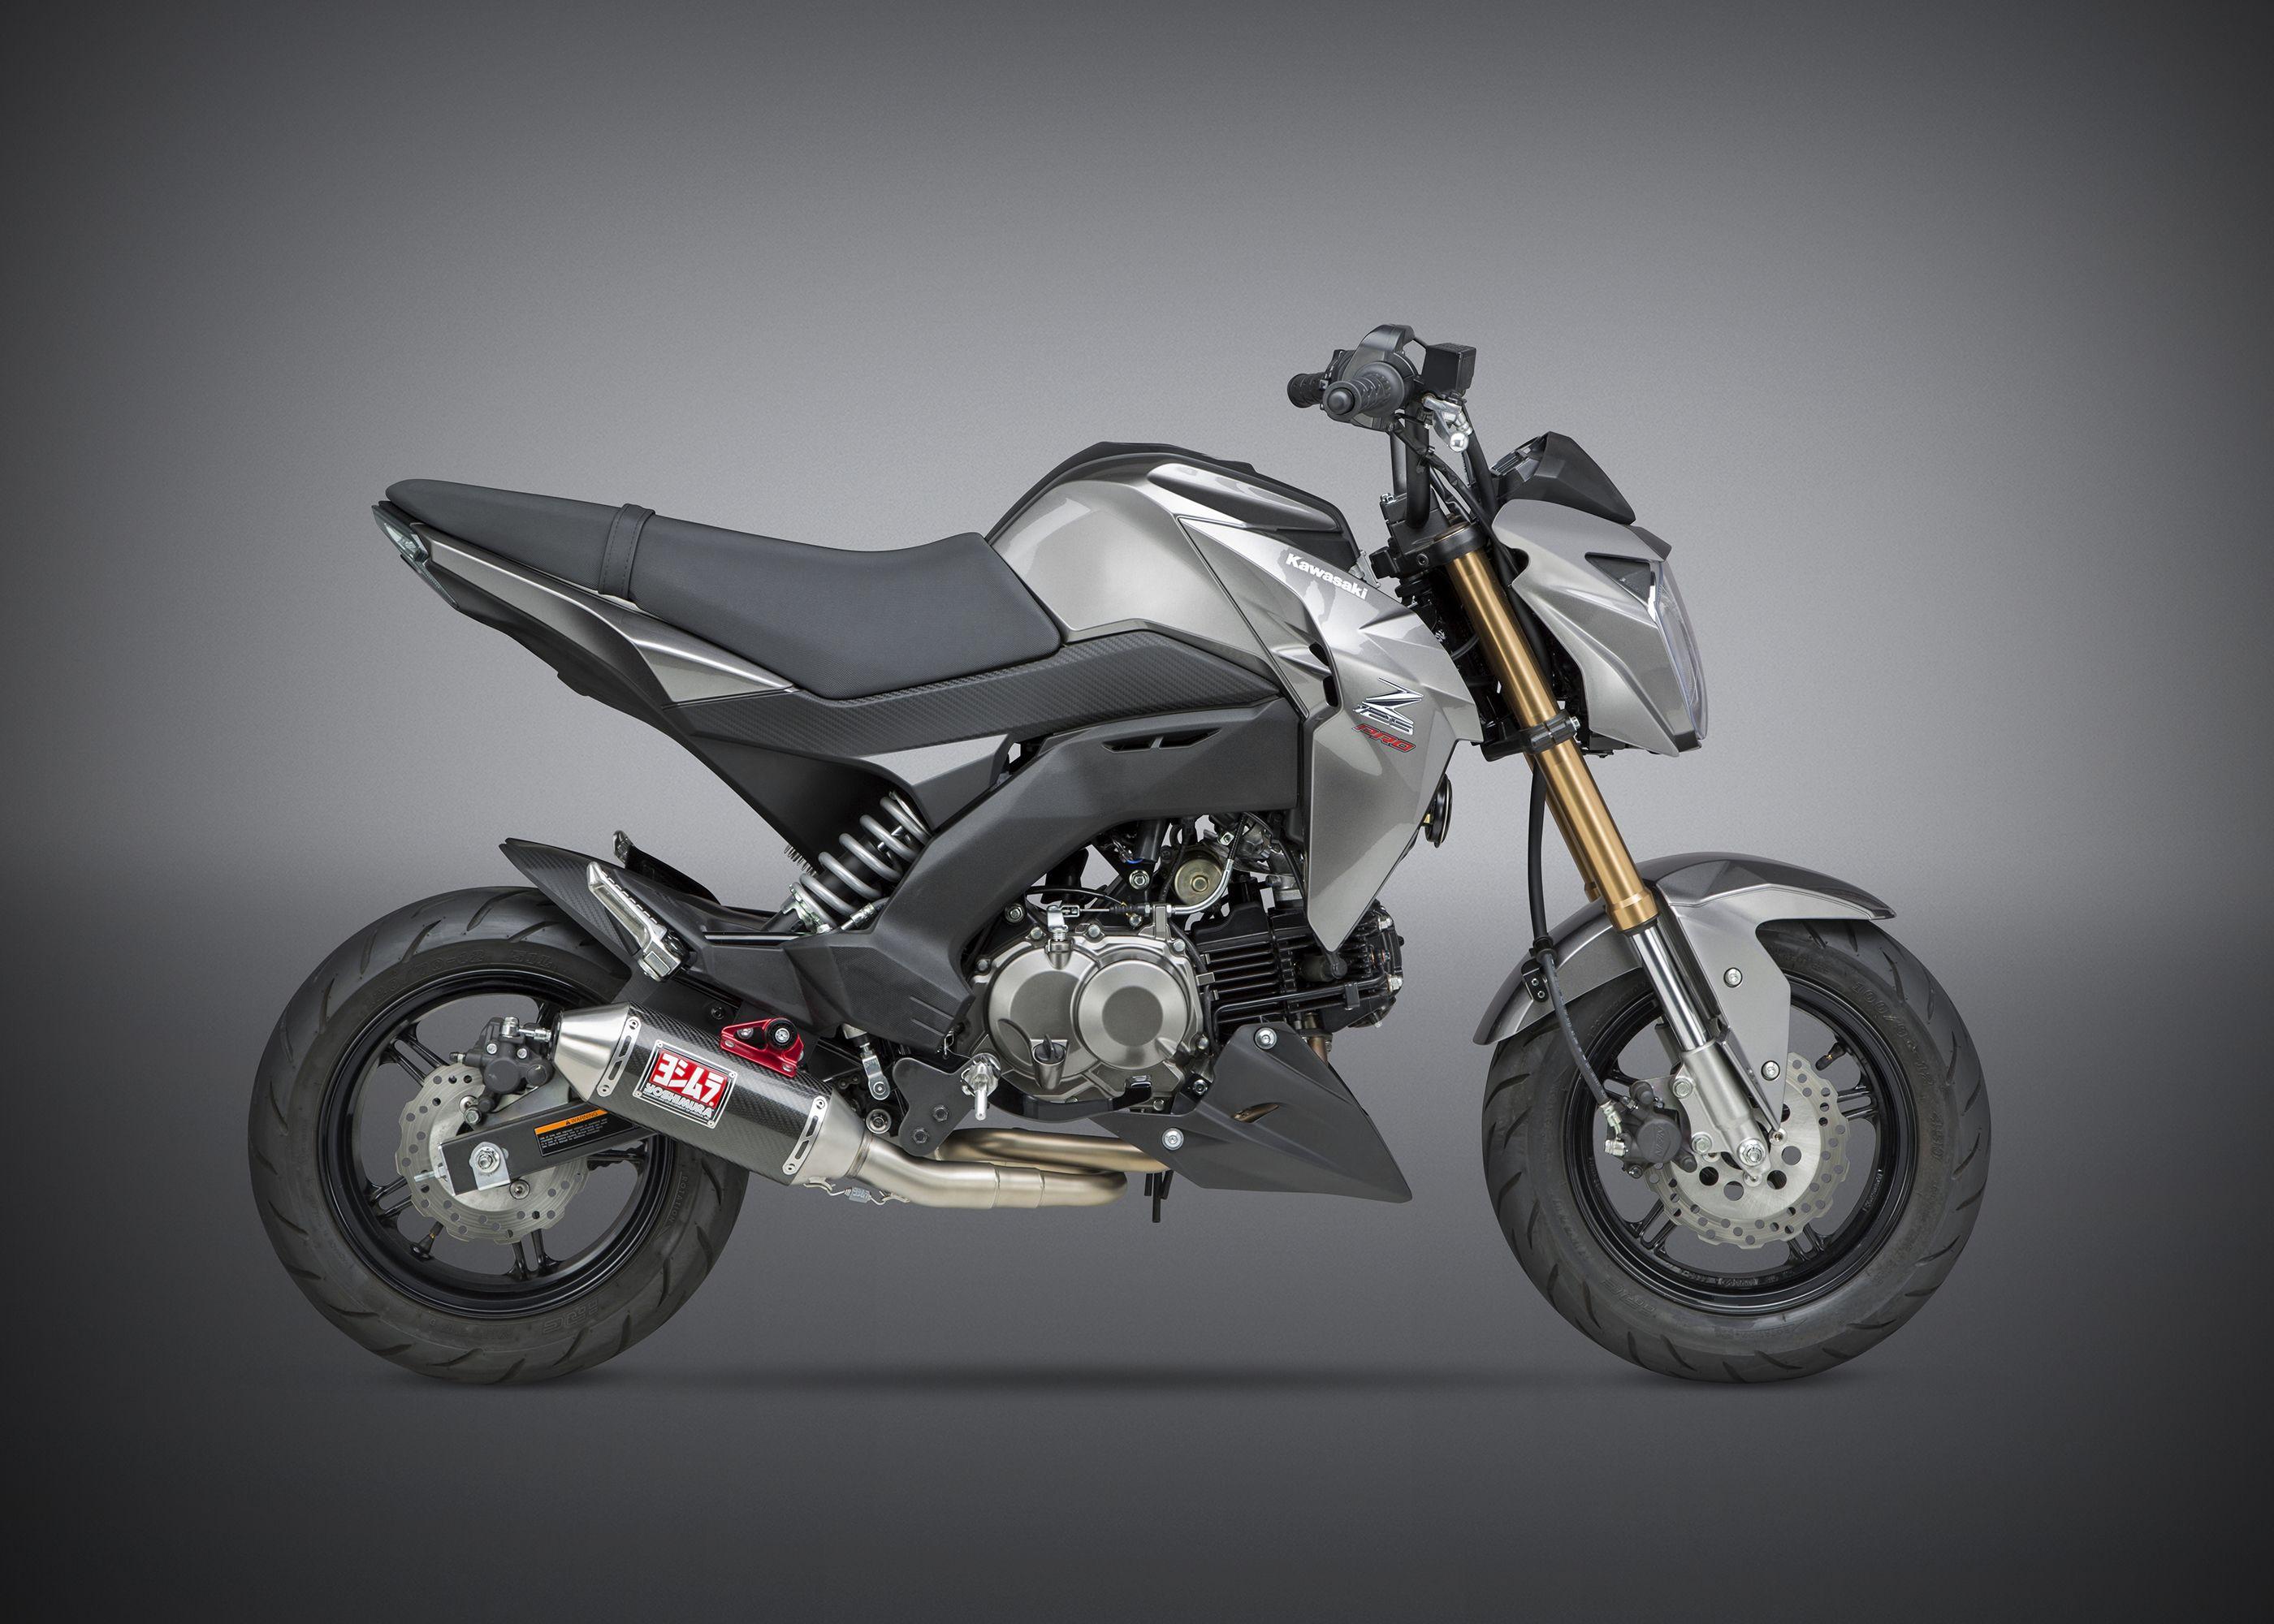 2017 Kawasaki Z125 Pro >> Yoshimura Releases 2017 Kawasaki Z125 Pro Applications